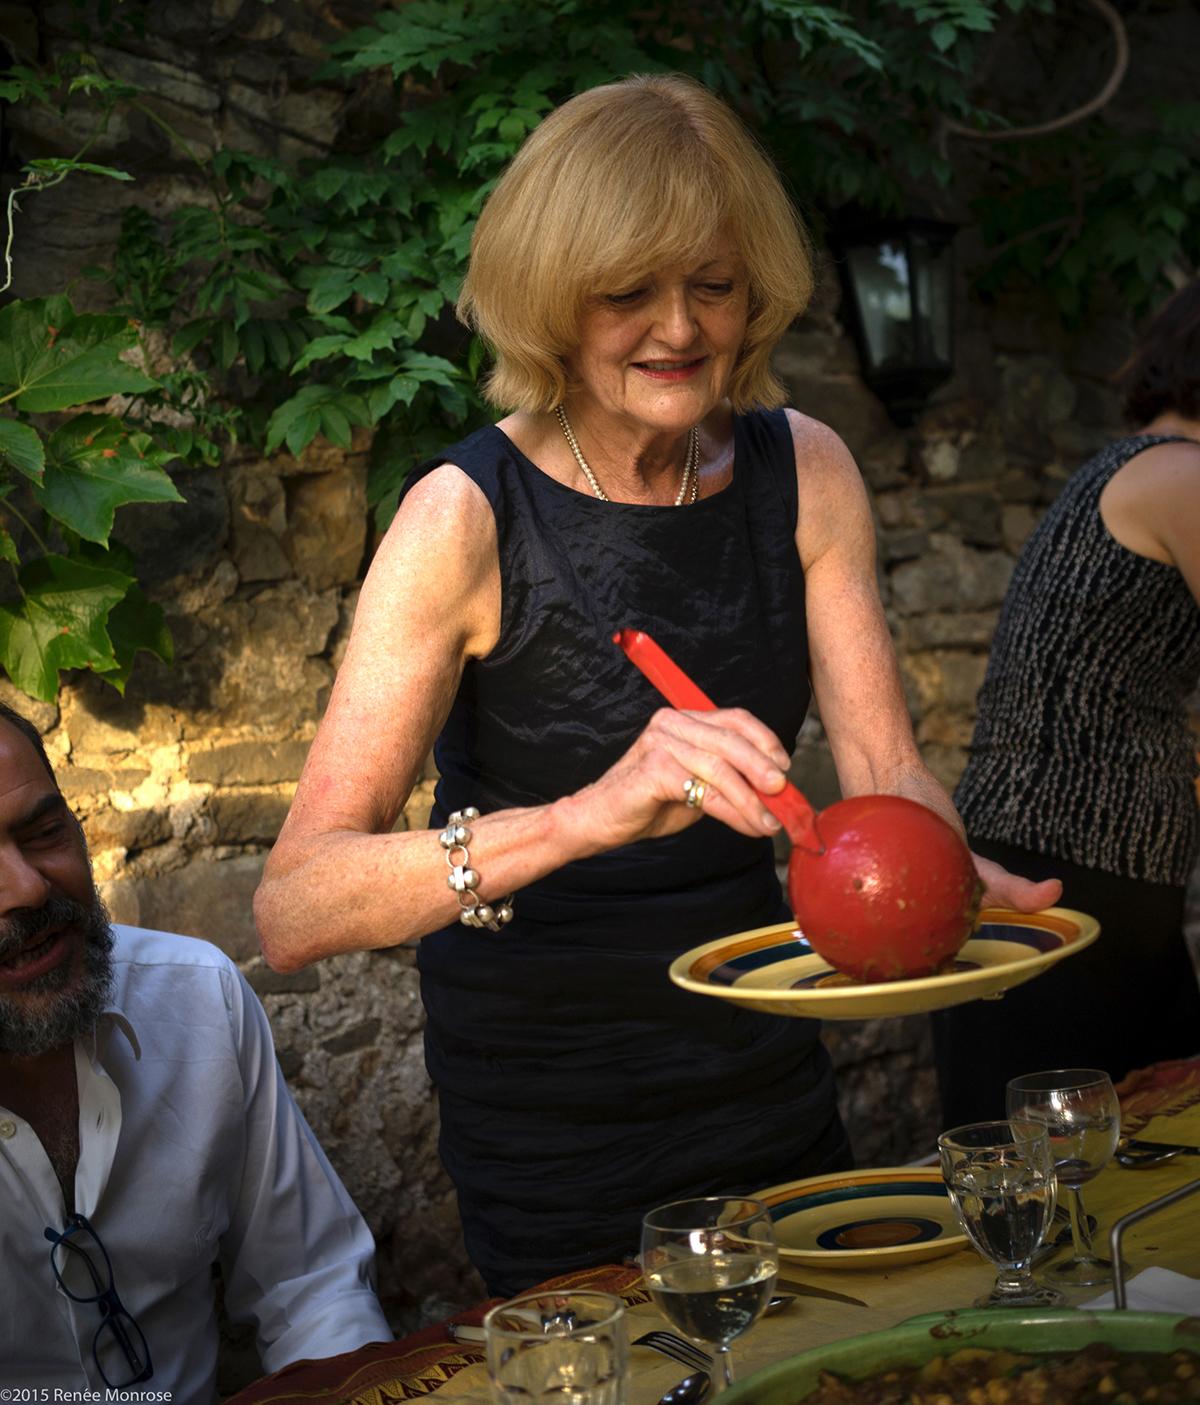 Food_Master_RetreatPhotography-Master-Retreat-2015-25.jpg